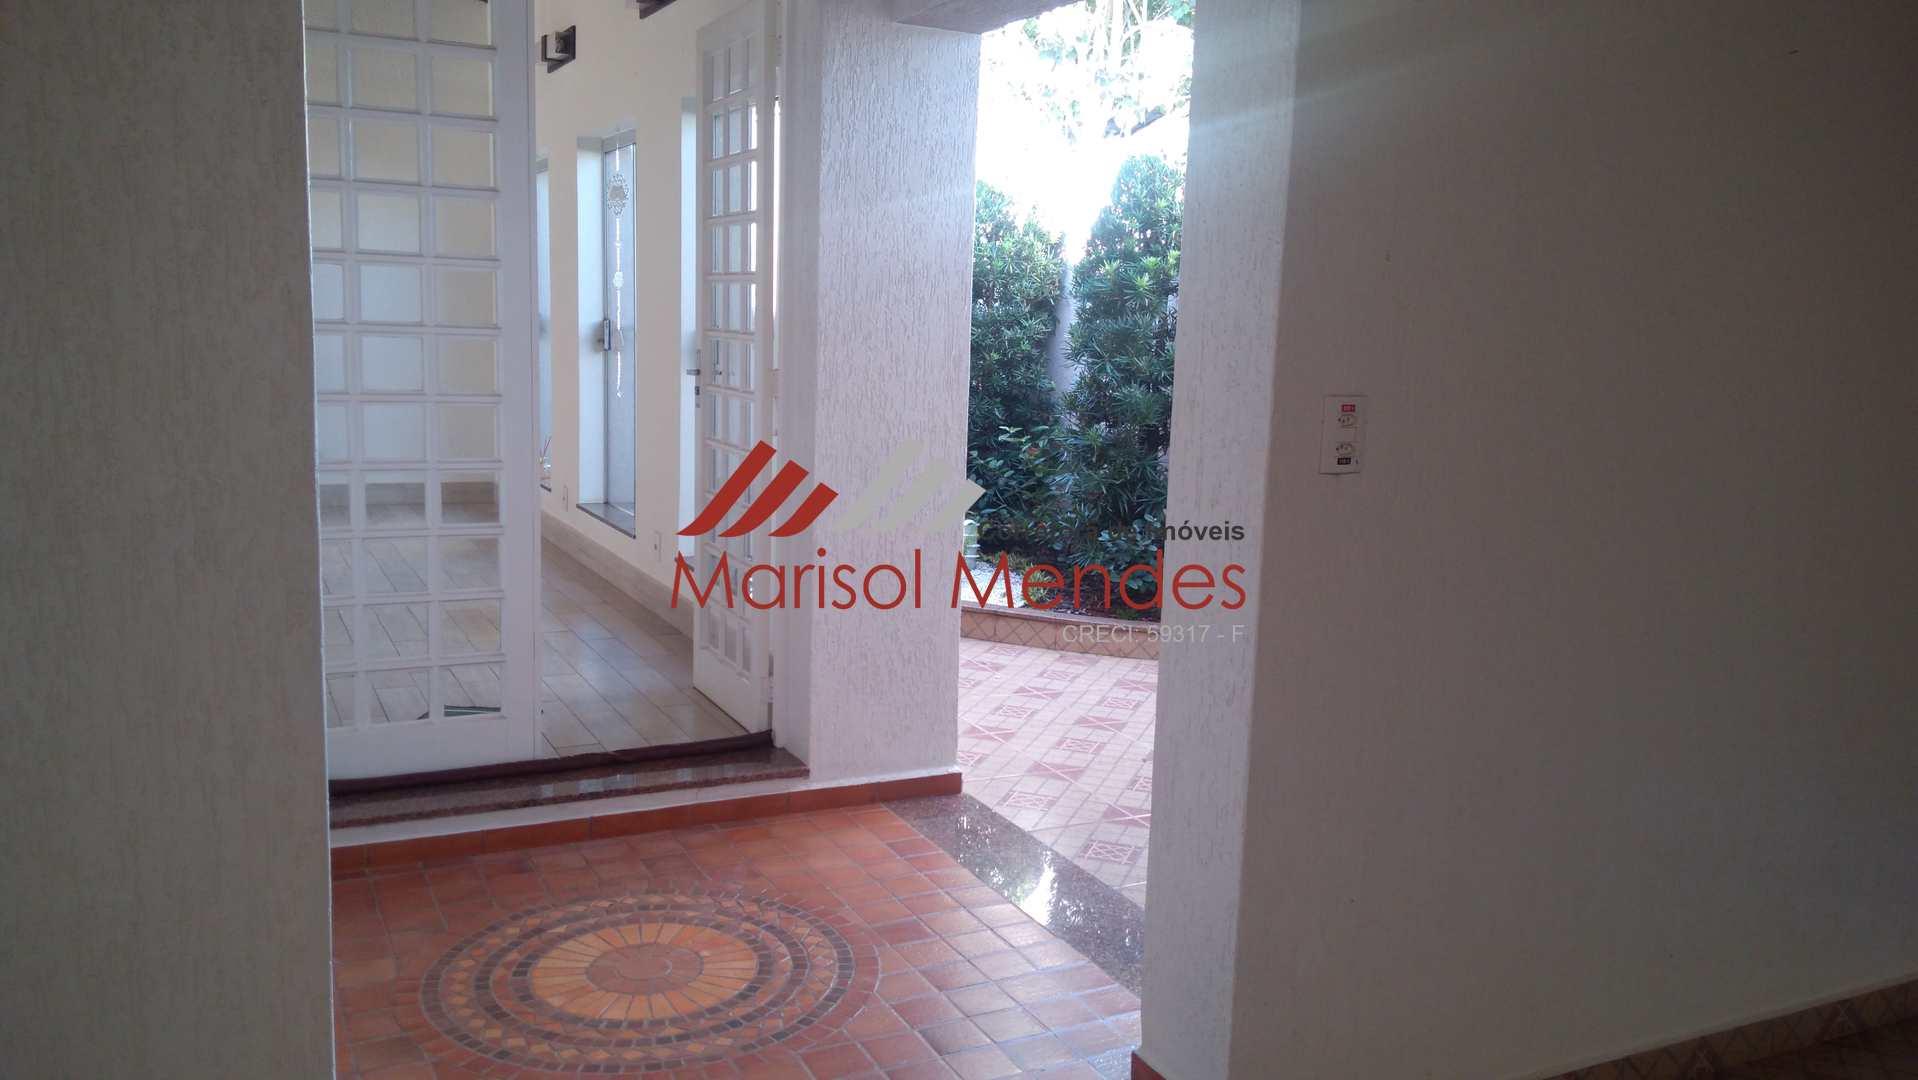 Casa com 3 dorms, Jardim Carlos Gomes, Pirassununga - R$ 1 mi, Cod: 54